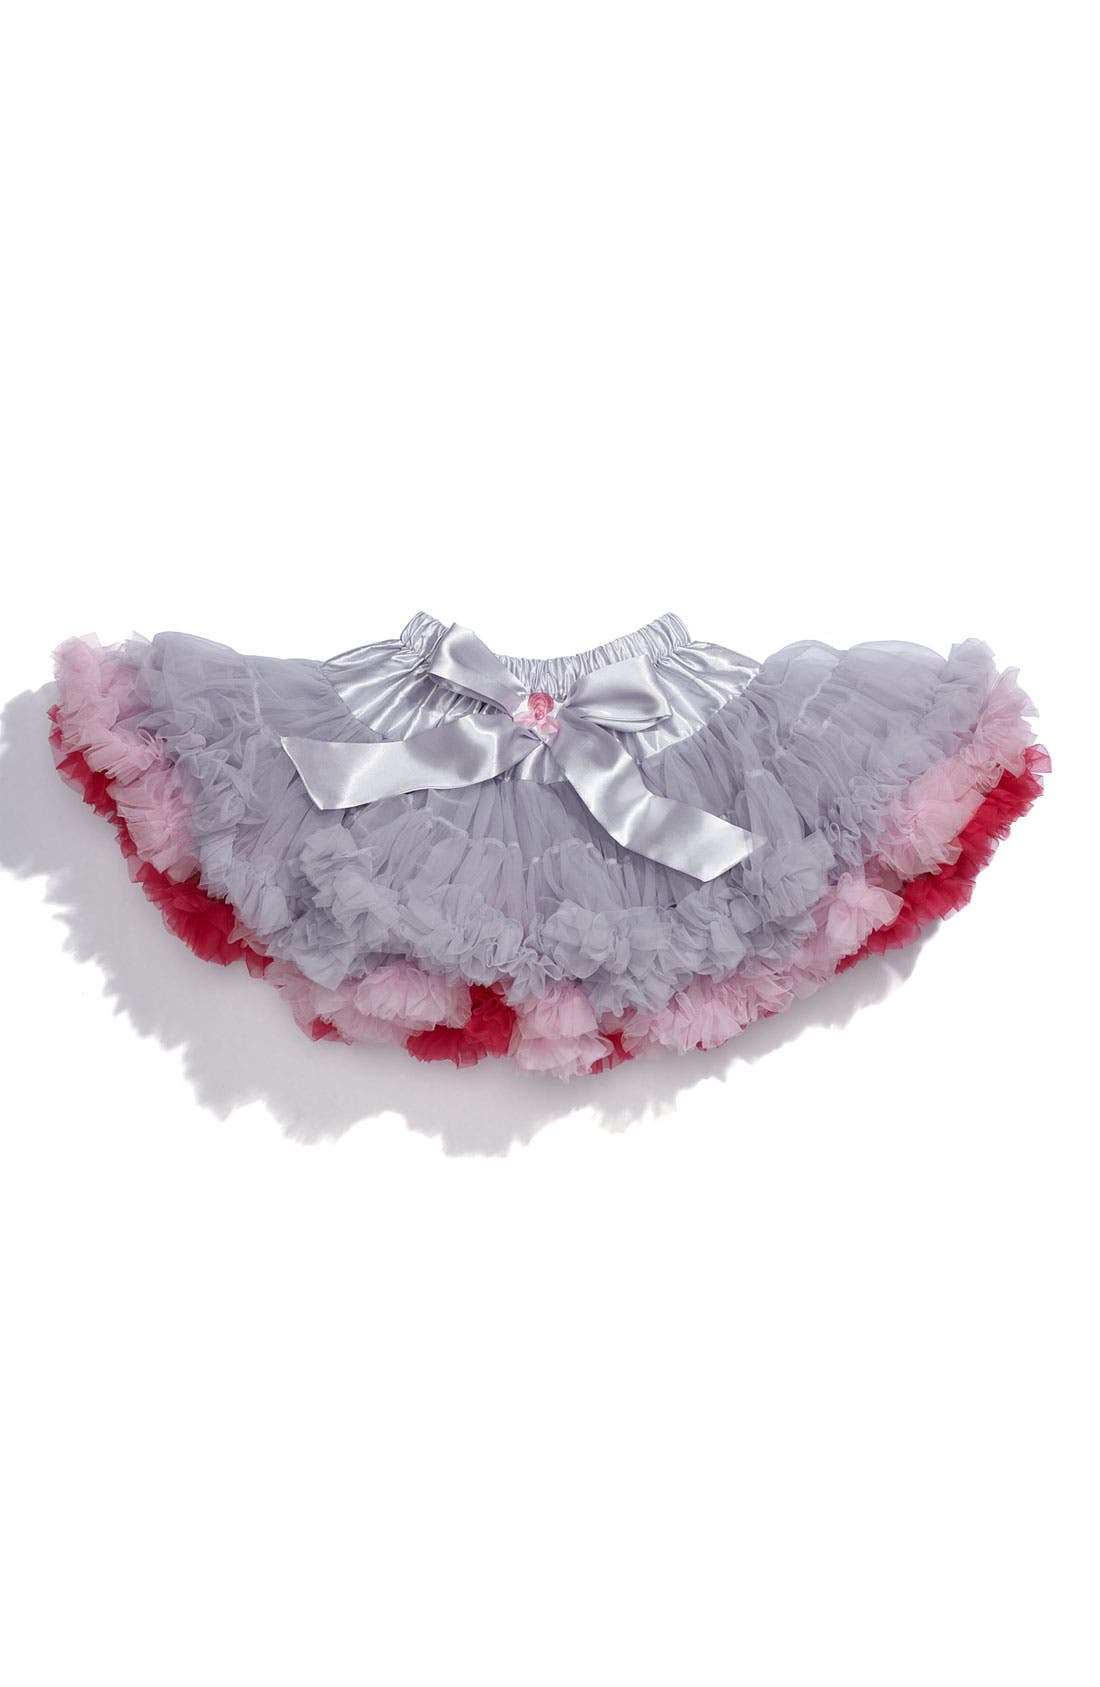 Main Image - PLH Bows & Laces Two Tone Pettiskirt (Infant)